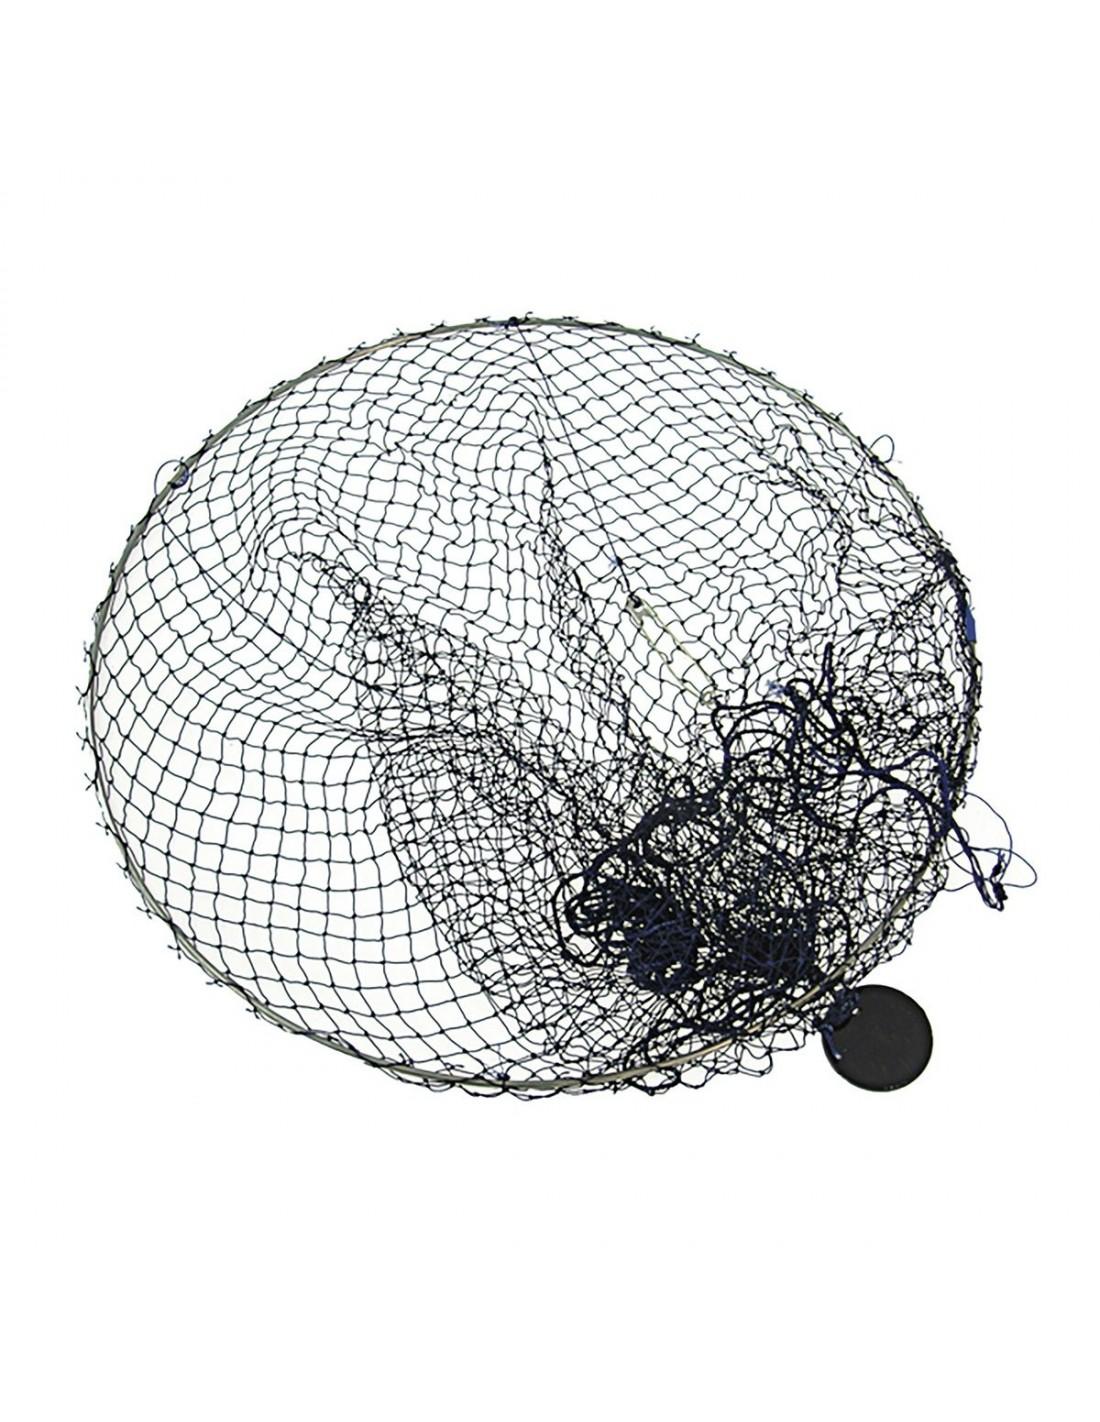 Håver & Klepp Sølvkroken Kaptein Sabeltann Fiskefanger 810063 124 kr